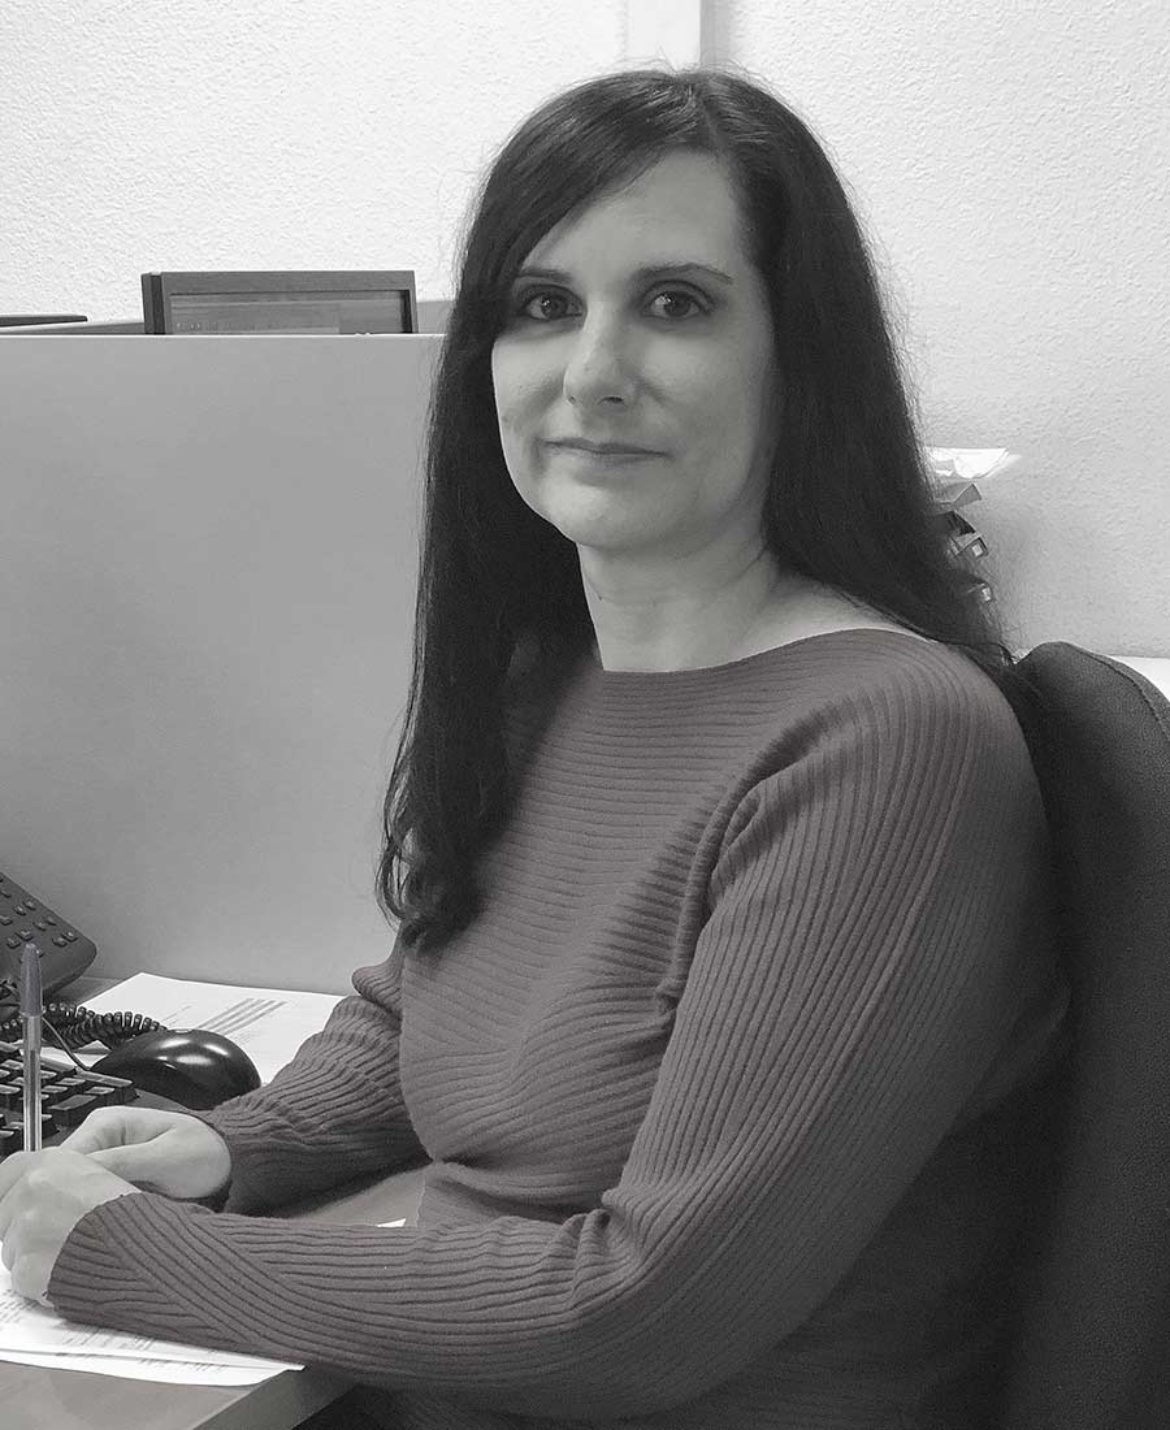 Elena Alcobendas Gutiérrez